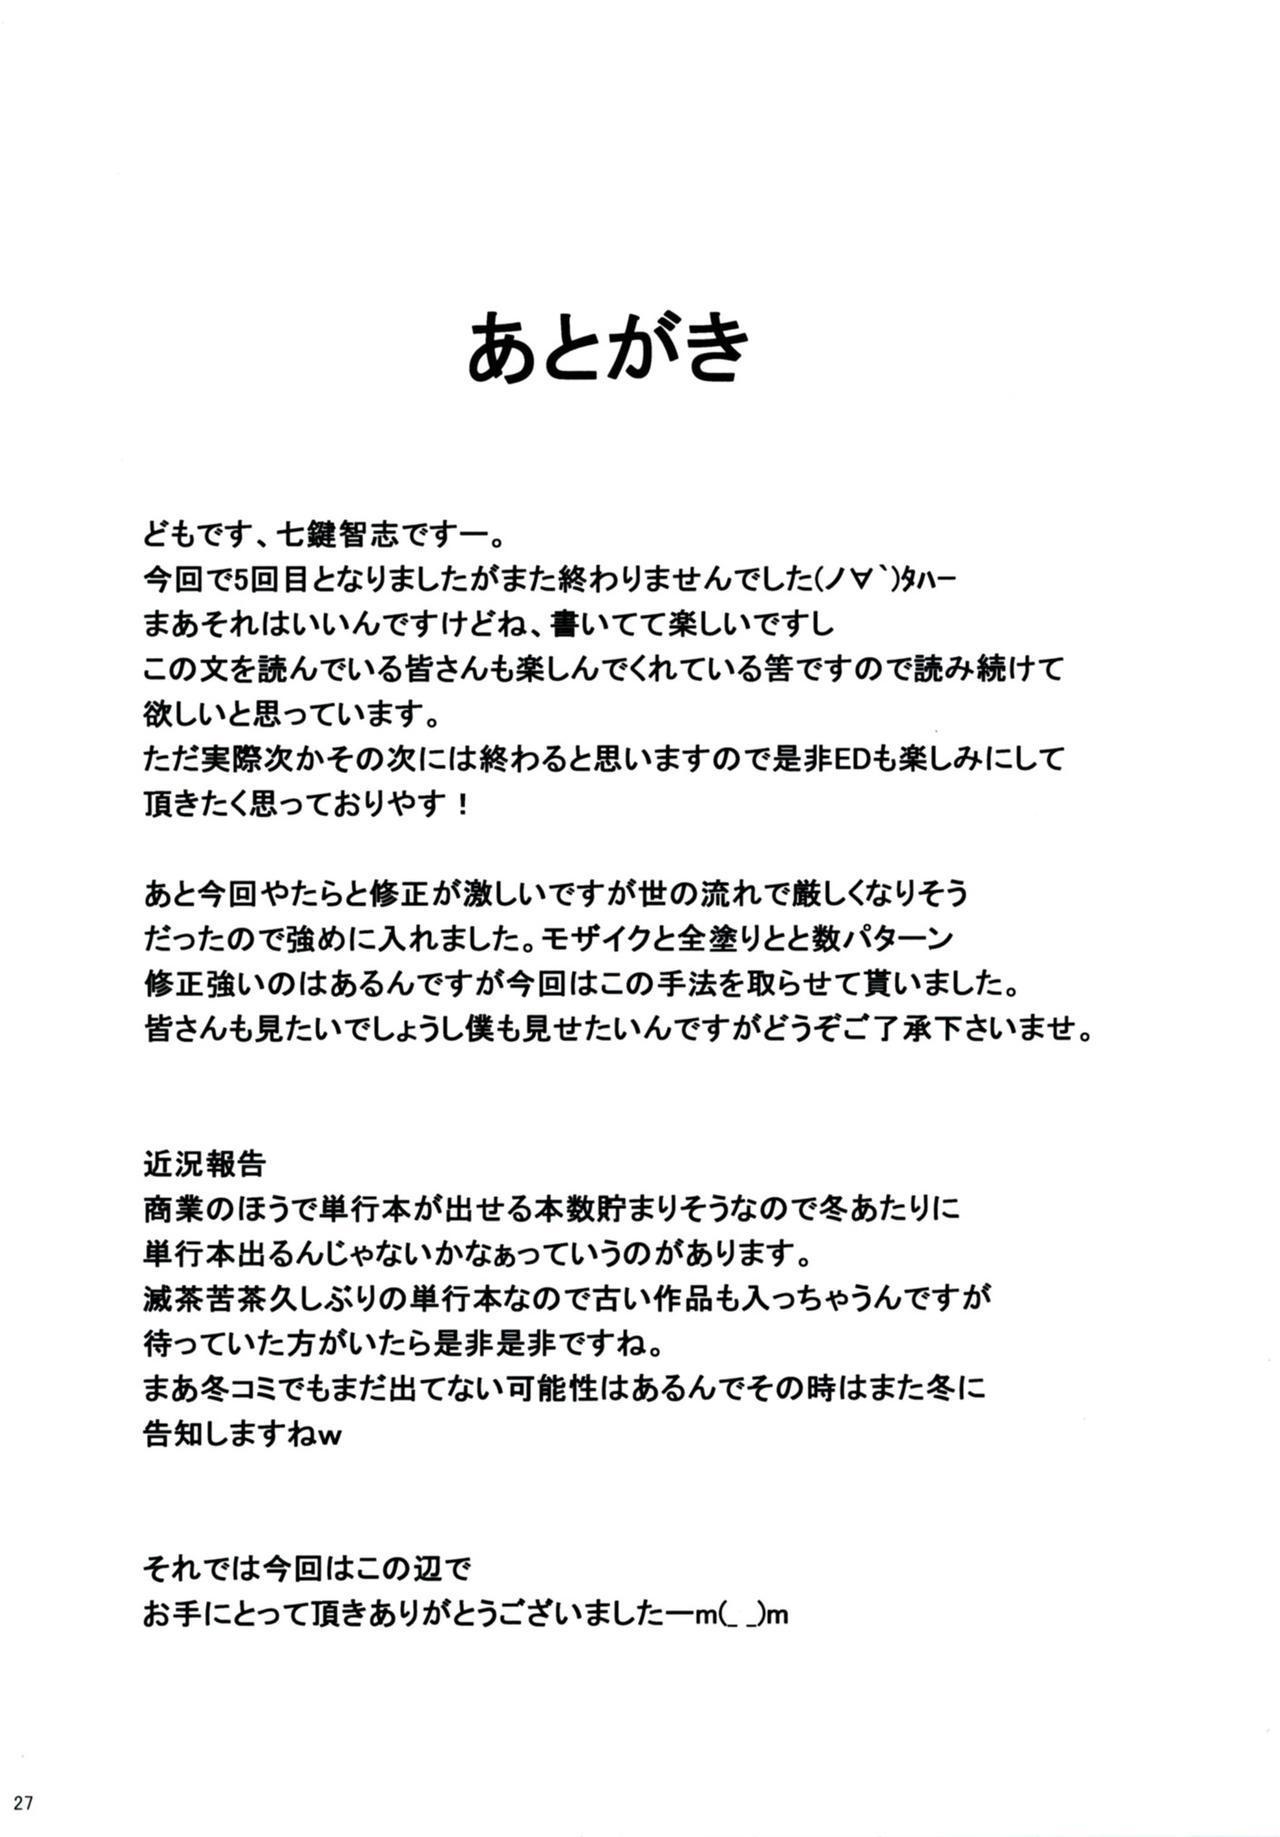 Gal Shota Cinderella 5 25